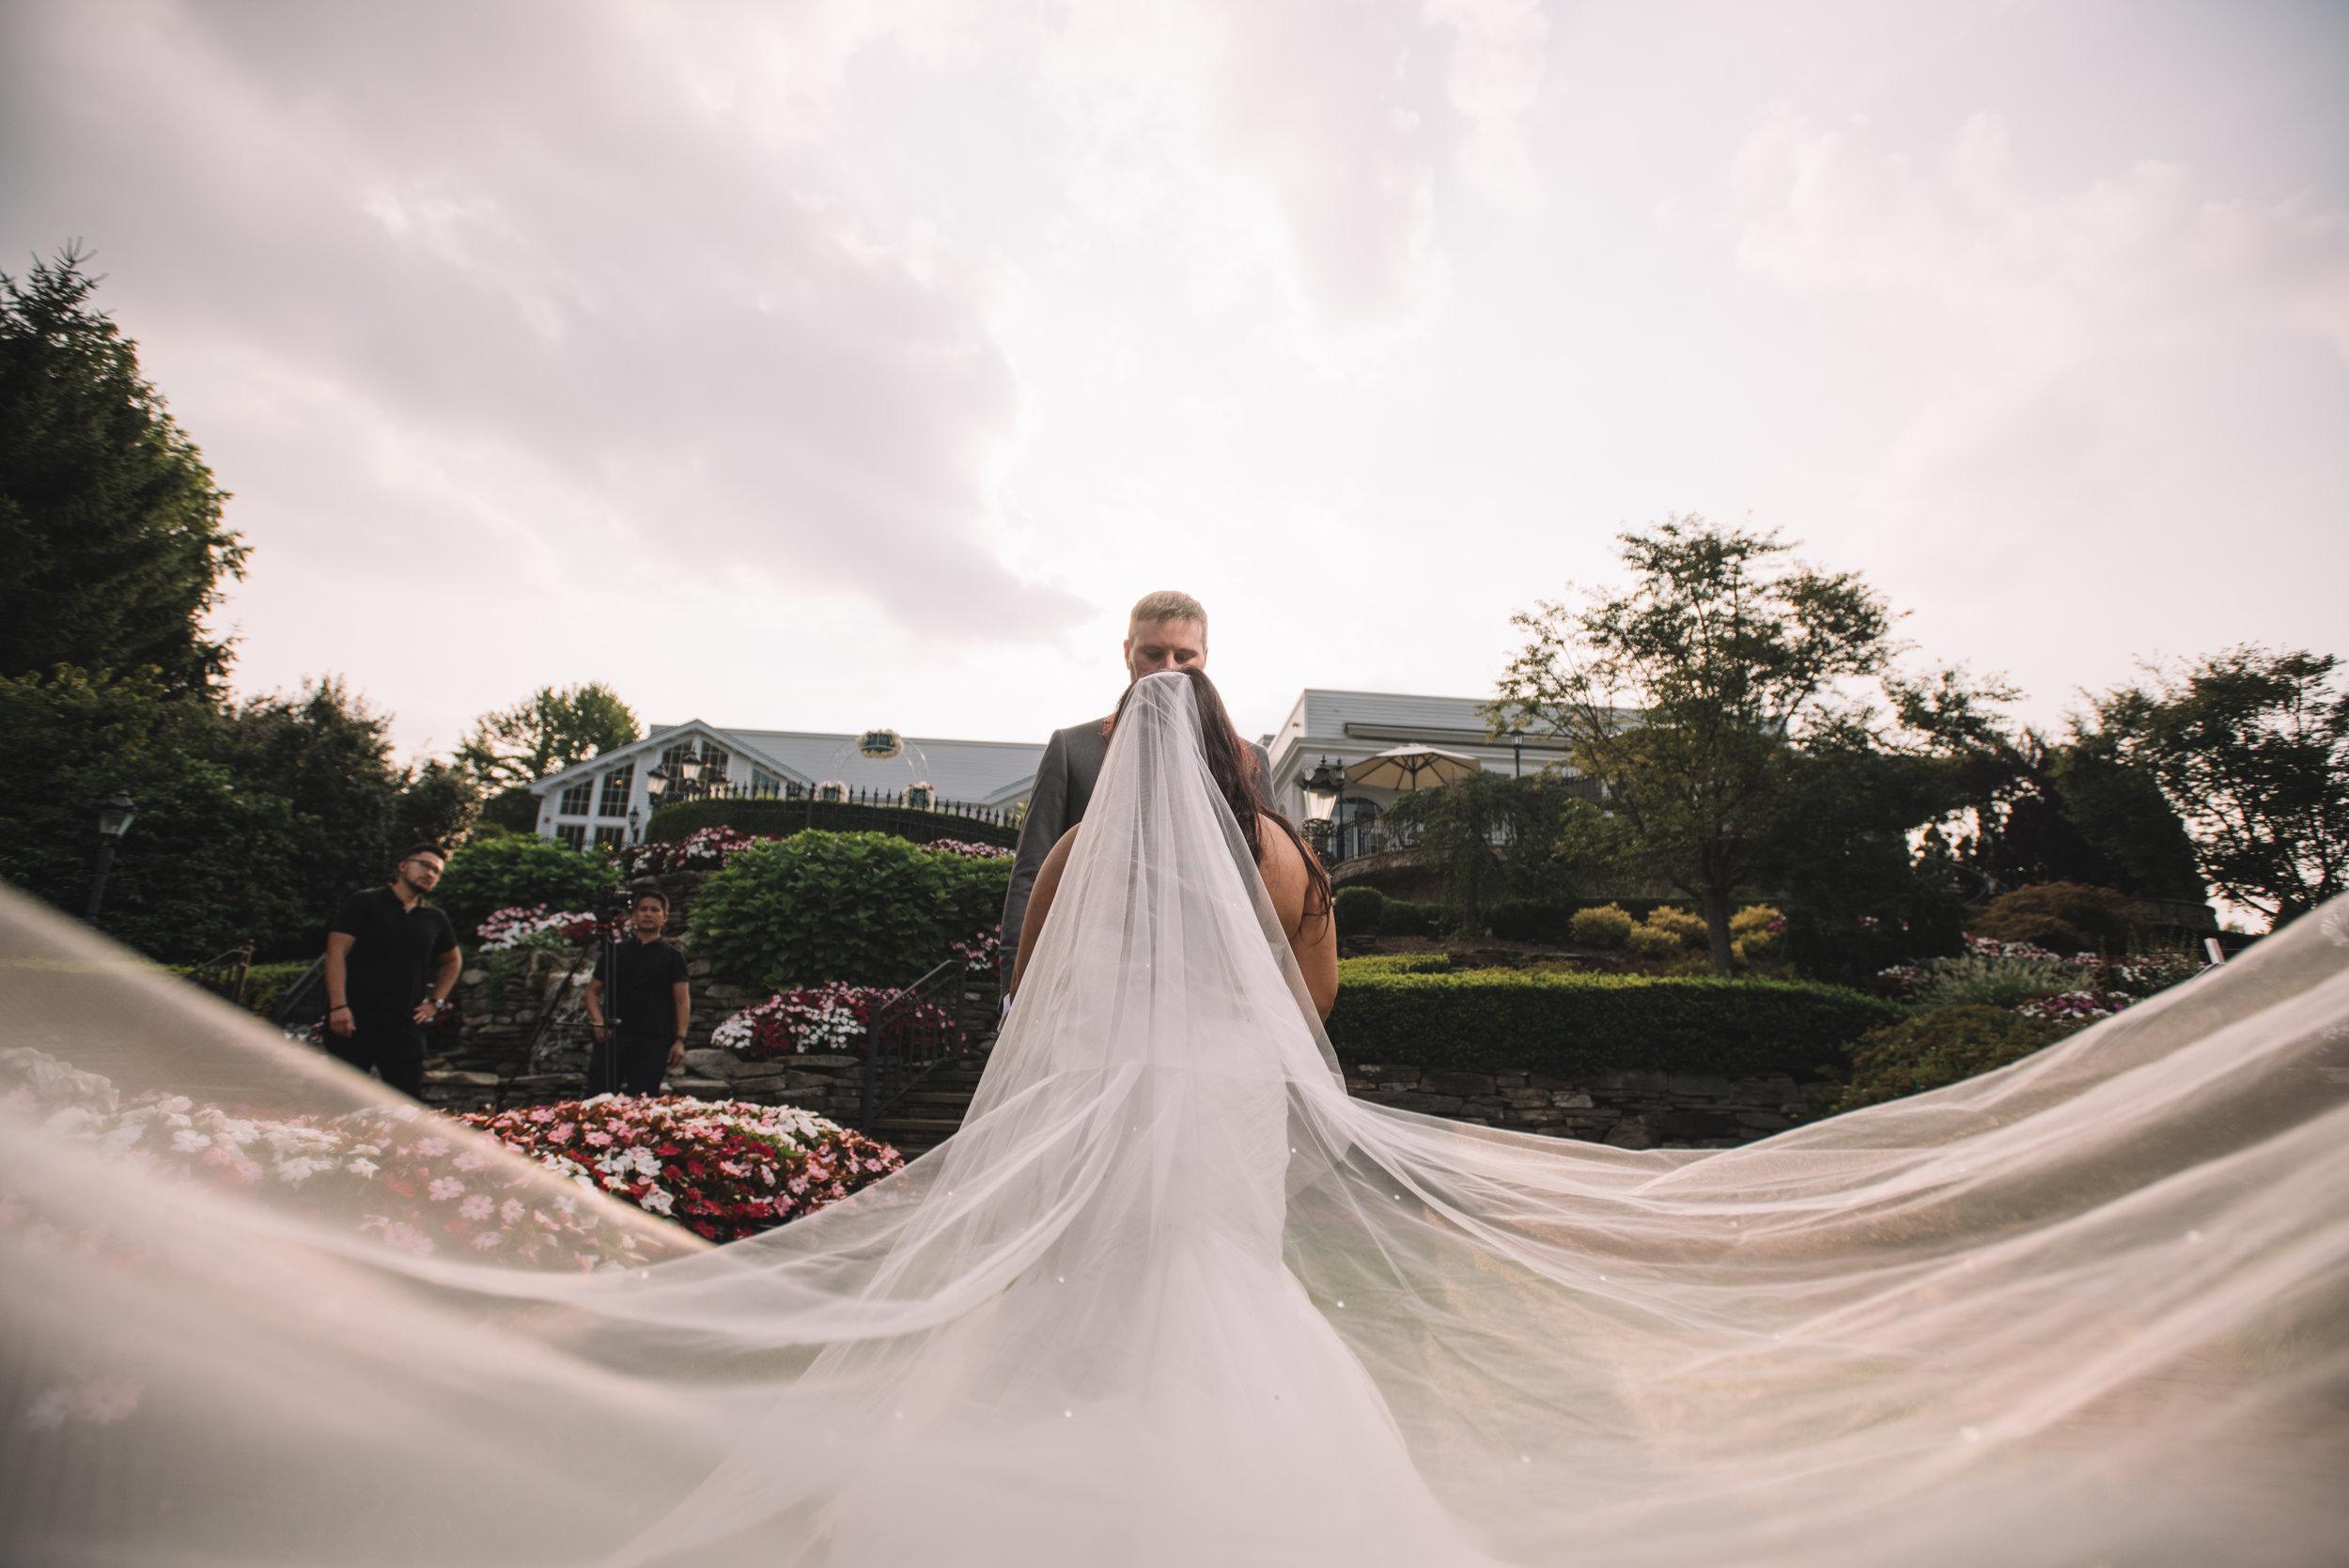 WeddingPhotos | NJPhotographer | Highlights-8-13.jpg